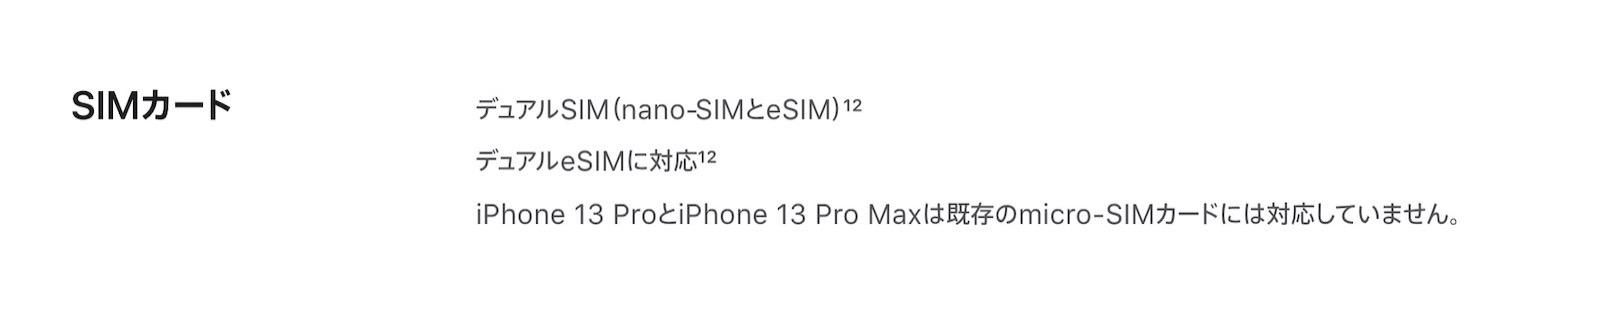 iphone13-dual-eSIM.jpg